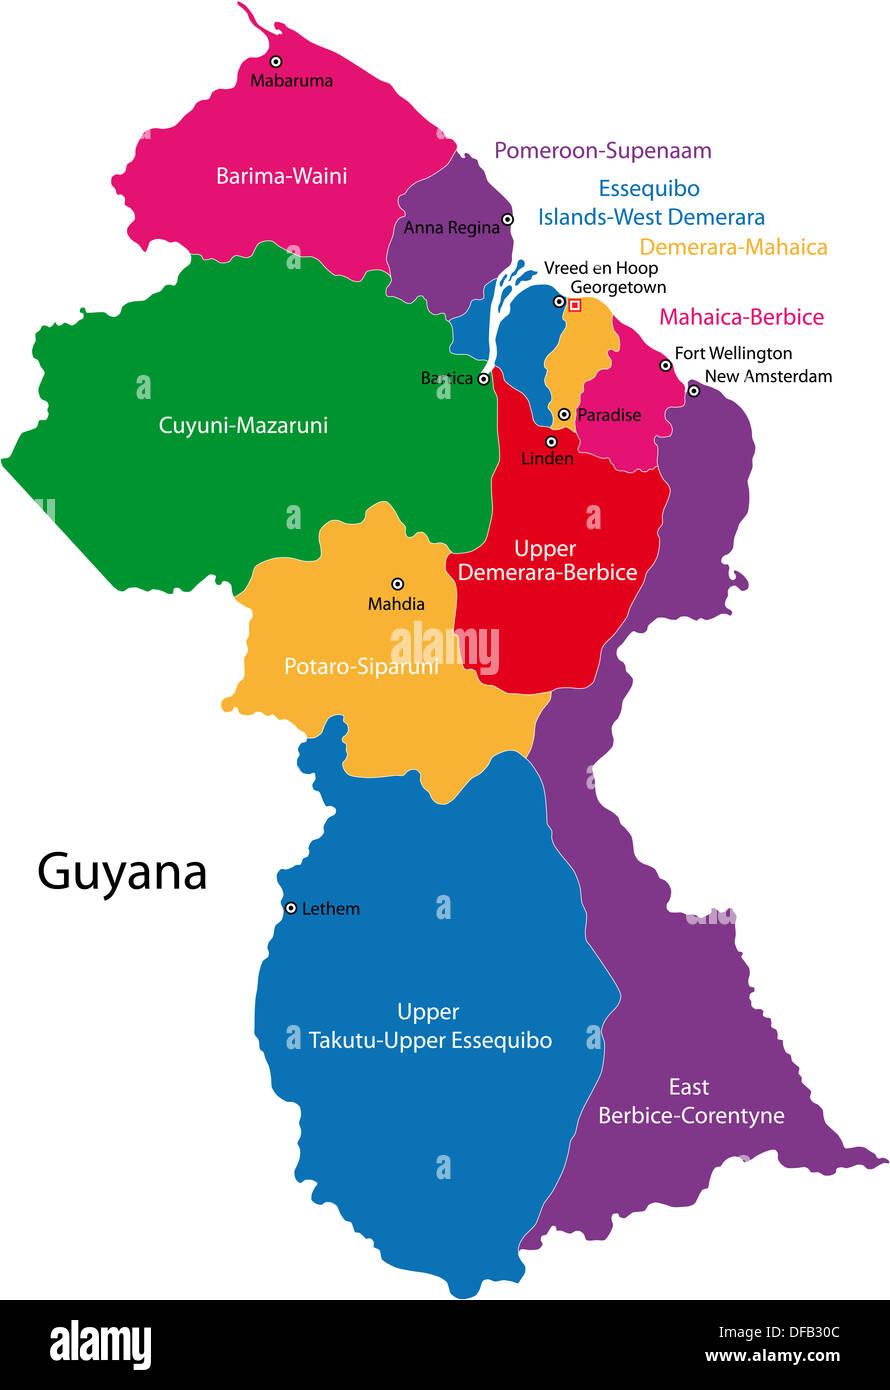 Guyana map Stock Photo: 61094780 - Alamy